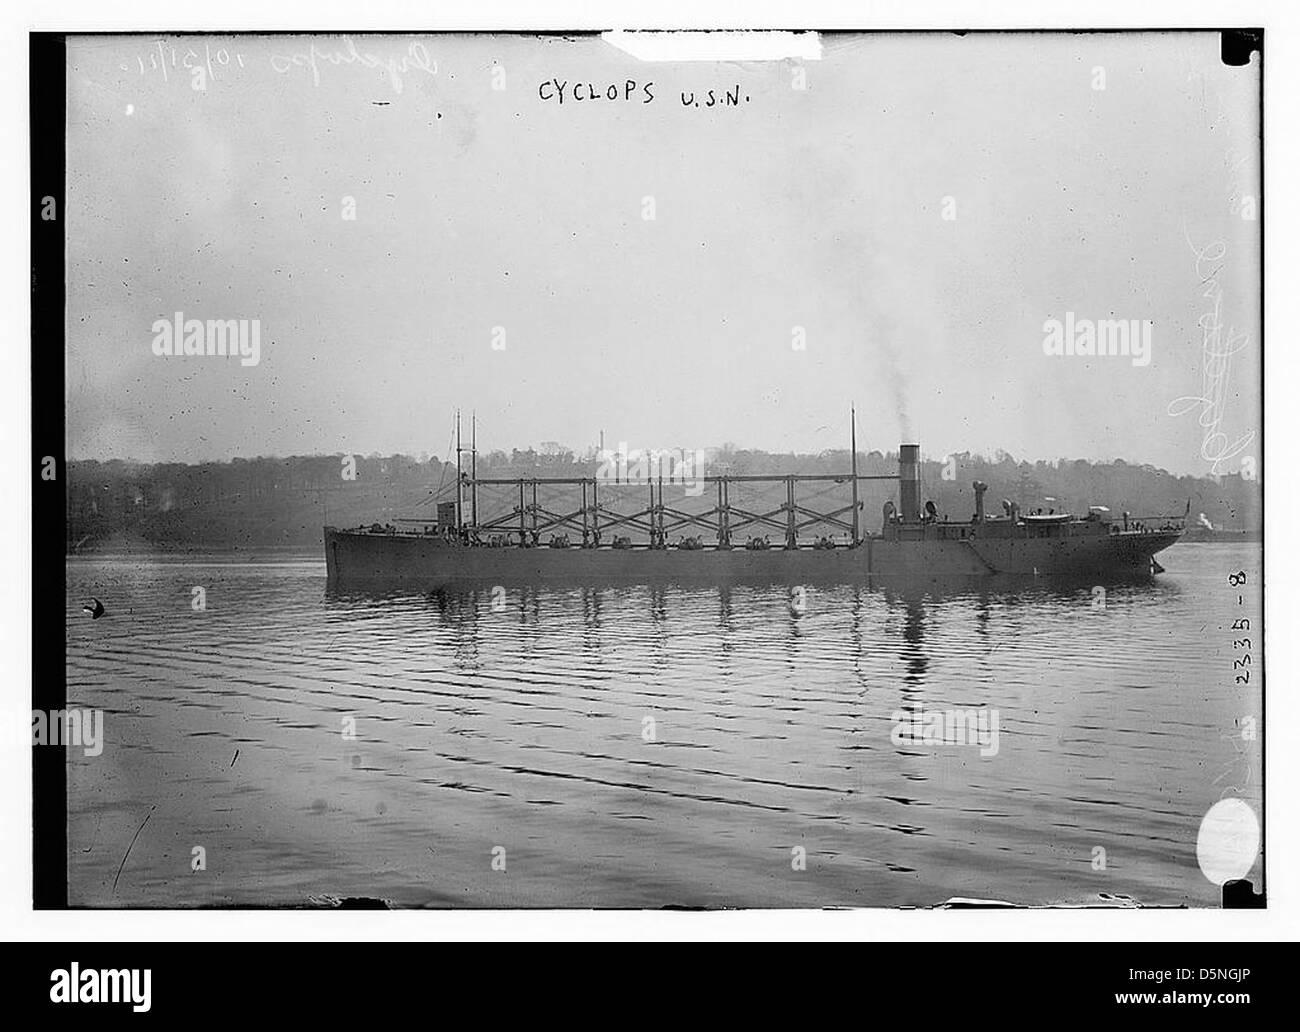 CYCLOPS U.S.N. (LOC) - Stock Image